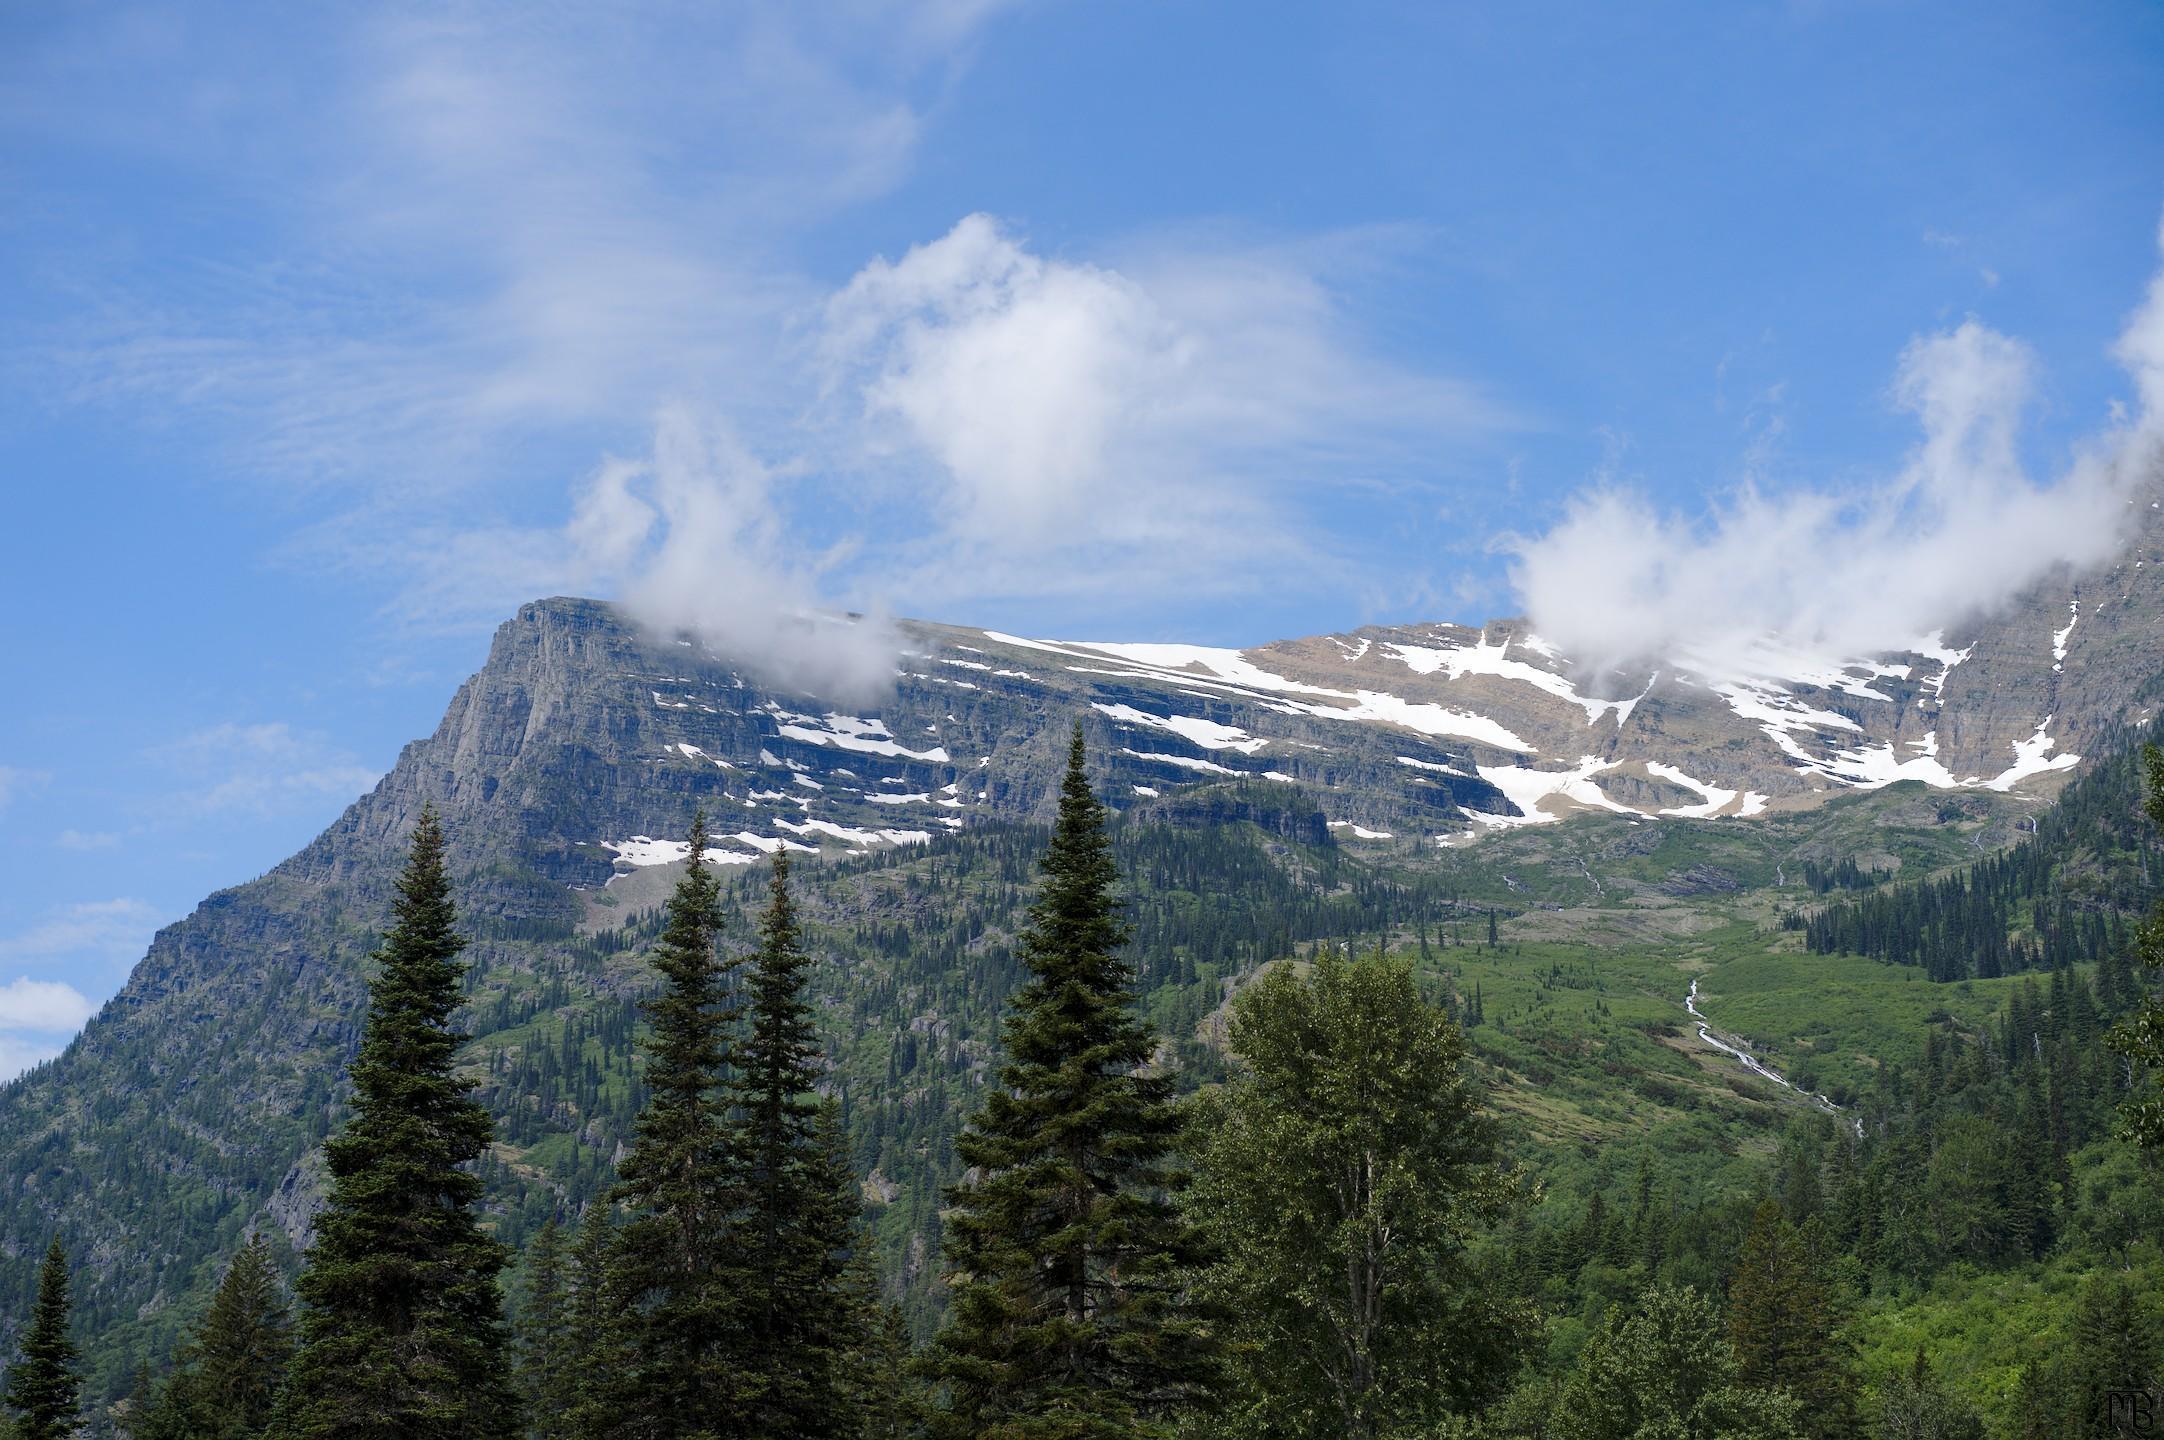 Mountain in Glacier National Park